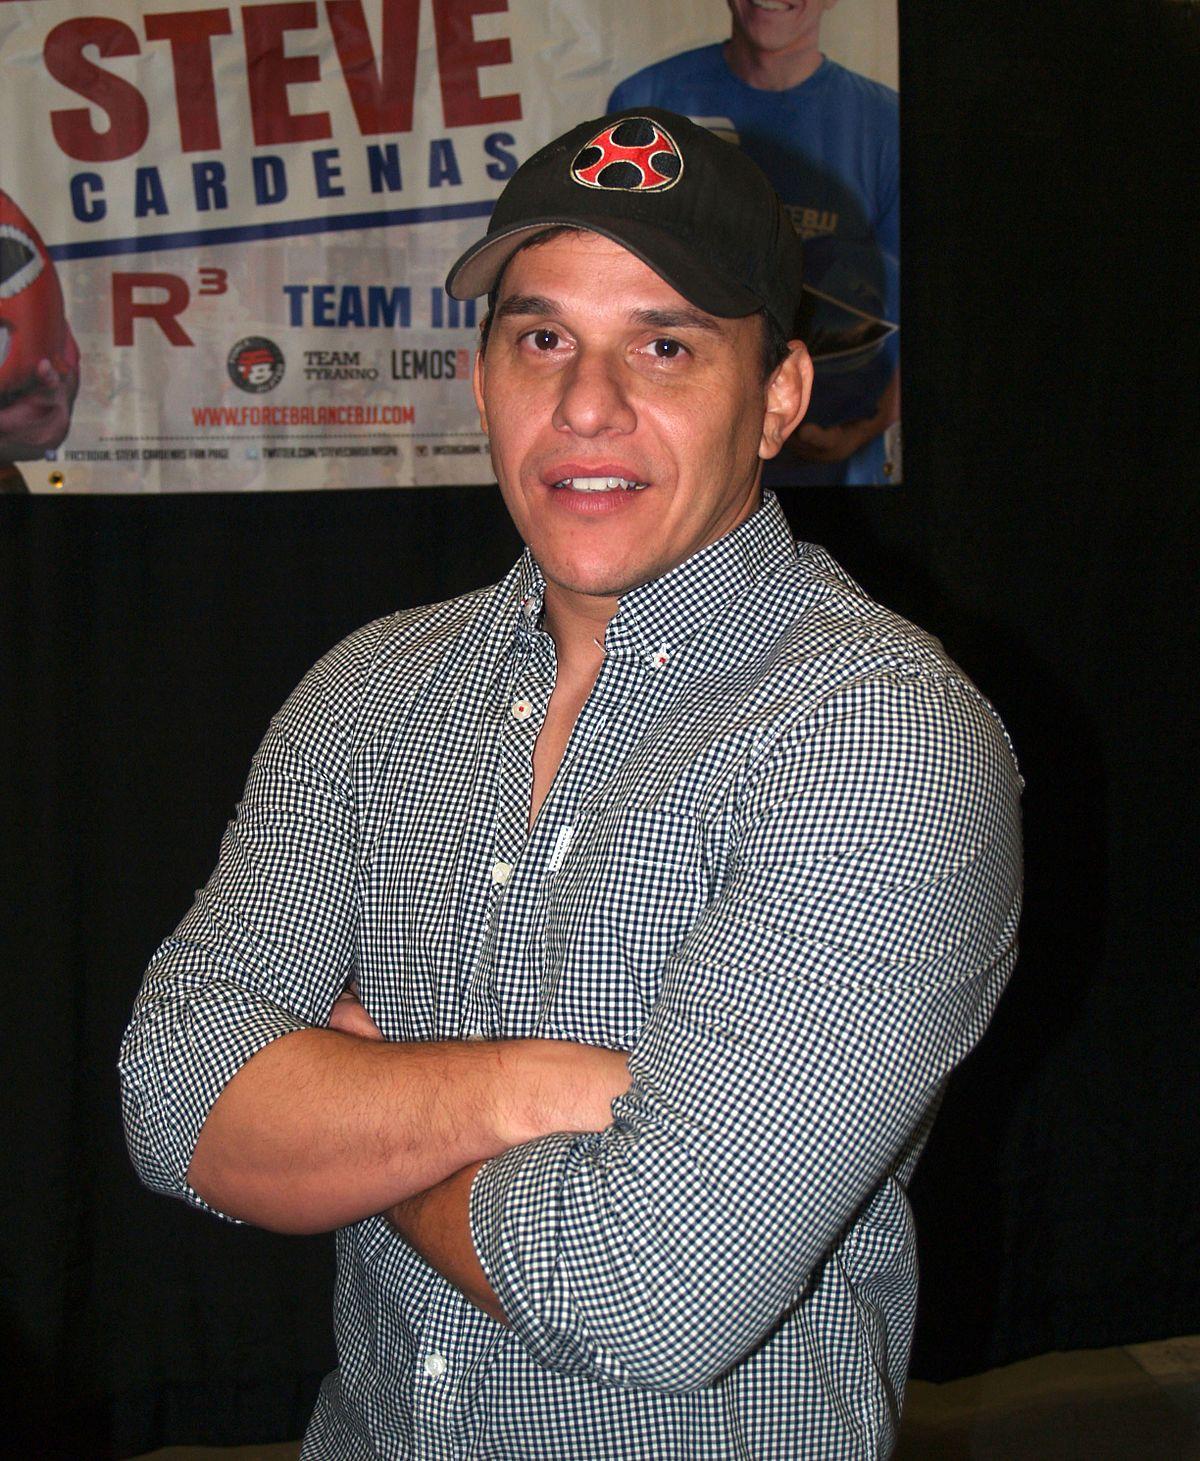 Steve Cardenas - Wikipedia